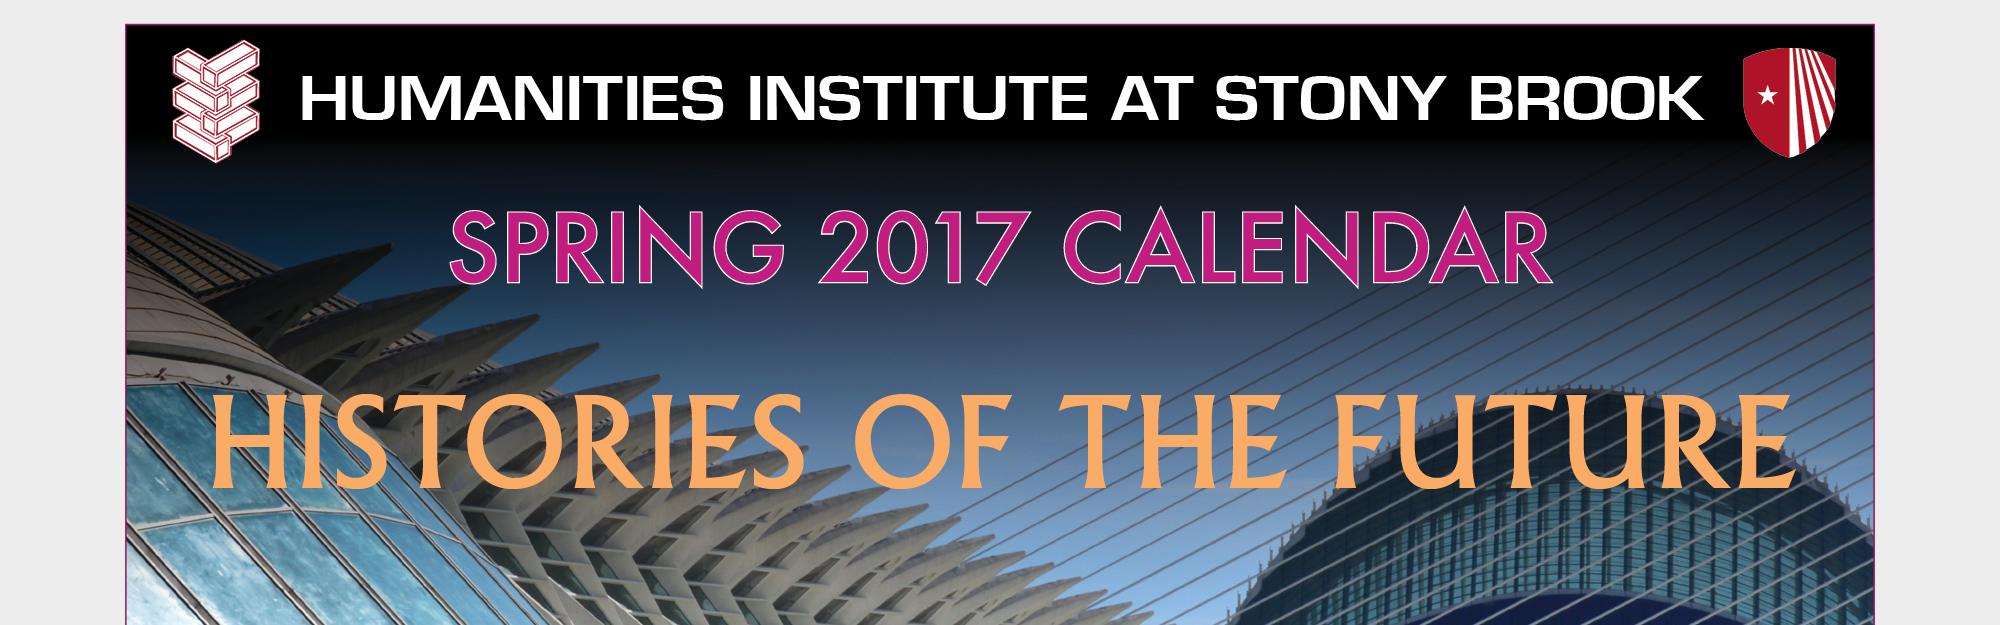 Spring 2017 Calendar